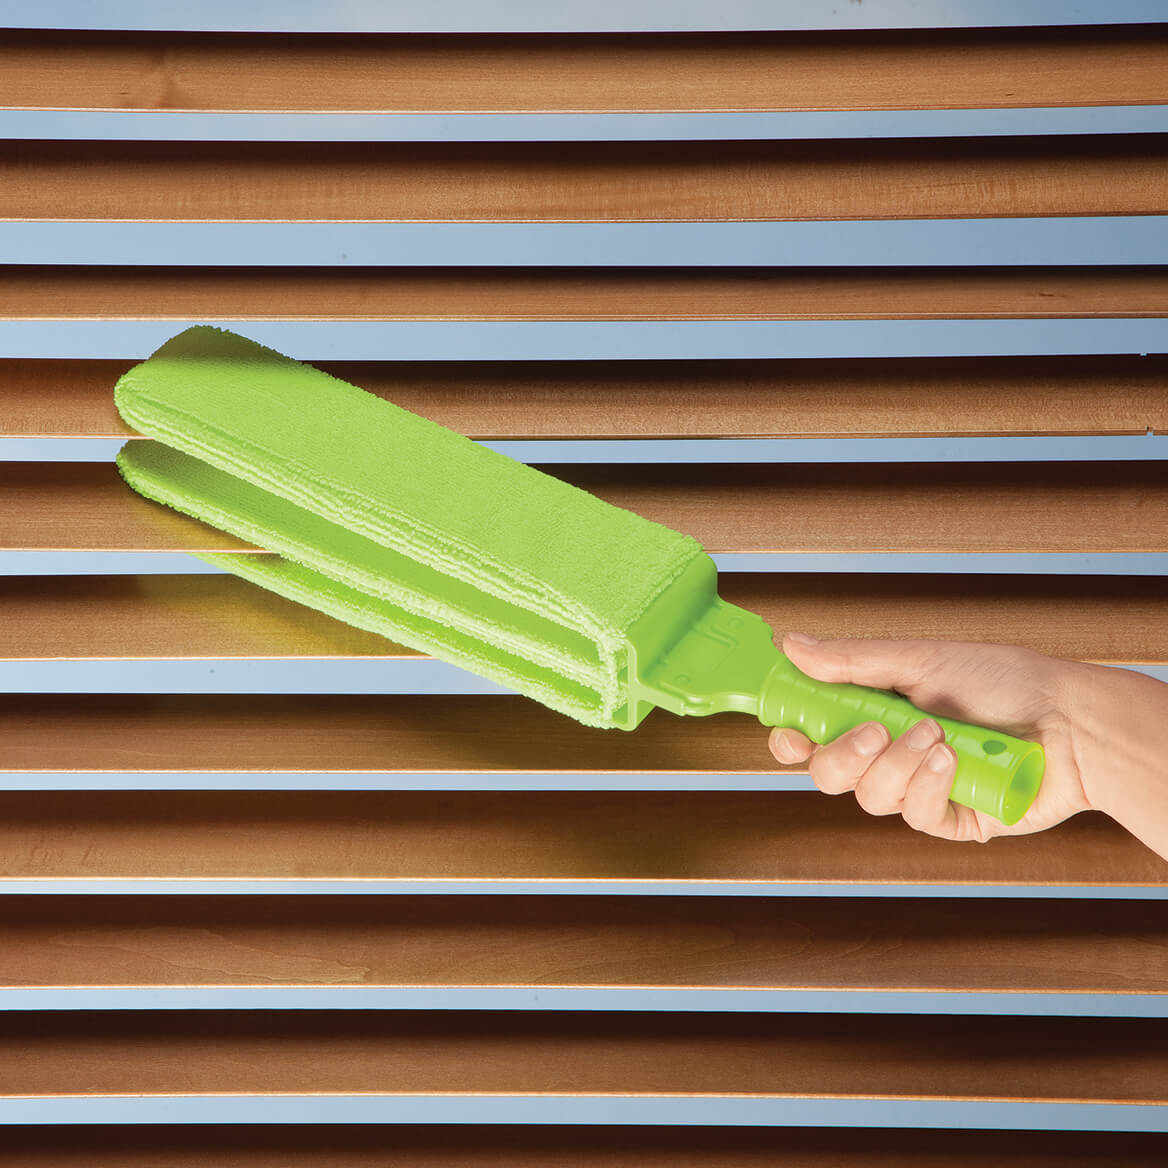 Jumbo Blind Cleaning Duster-357945